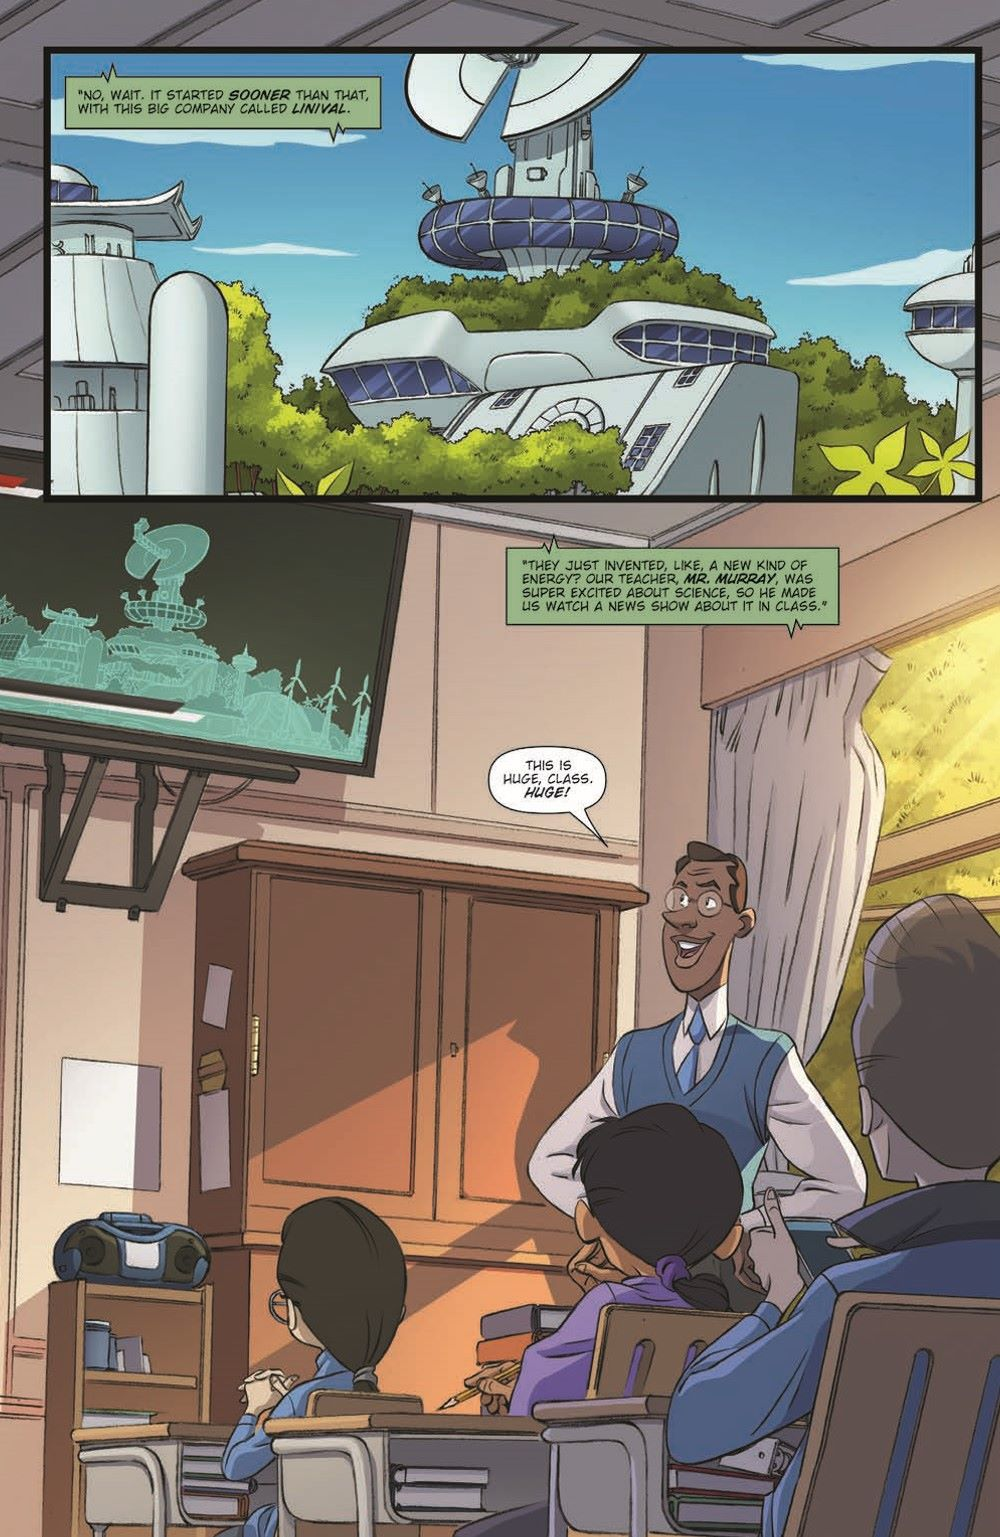 Godzilla_MnP_01_pr-5 ComicList Previews: GODZILLA MONSTERS AND PROTECTORS #1 (OF 5)